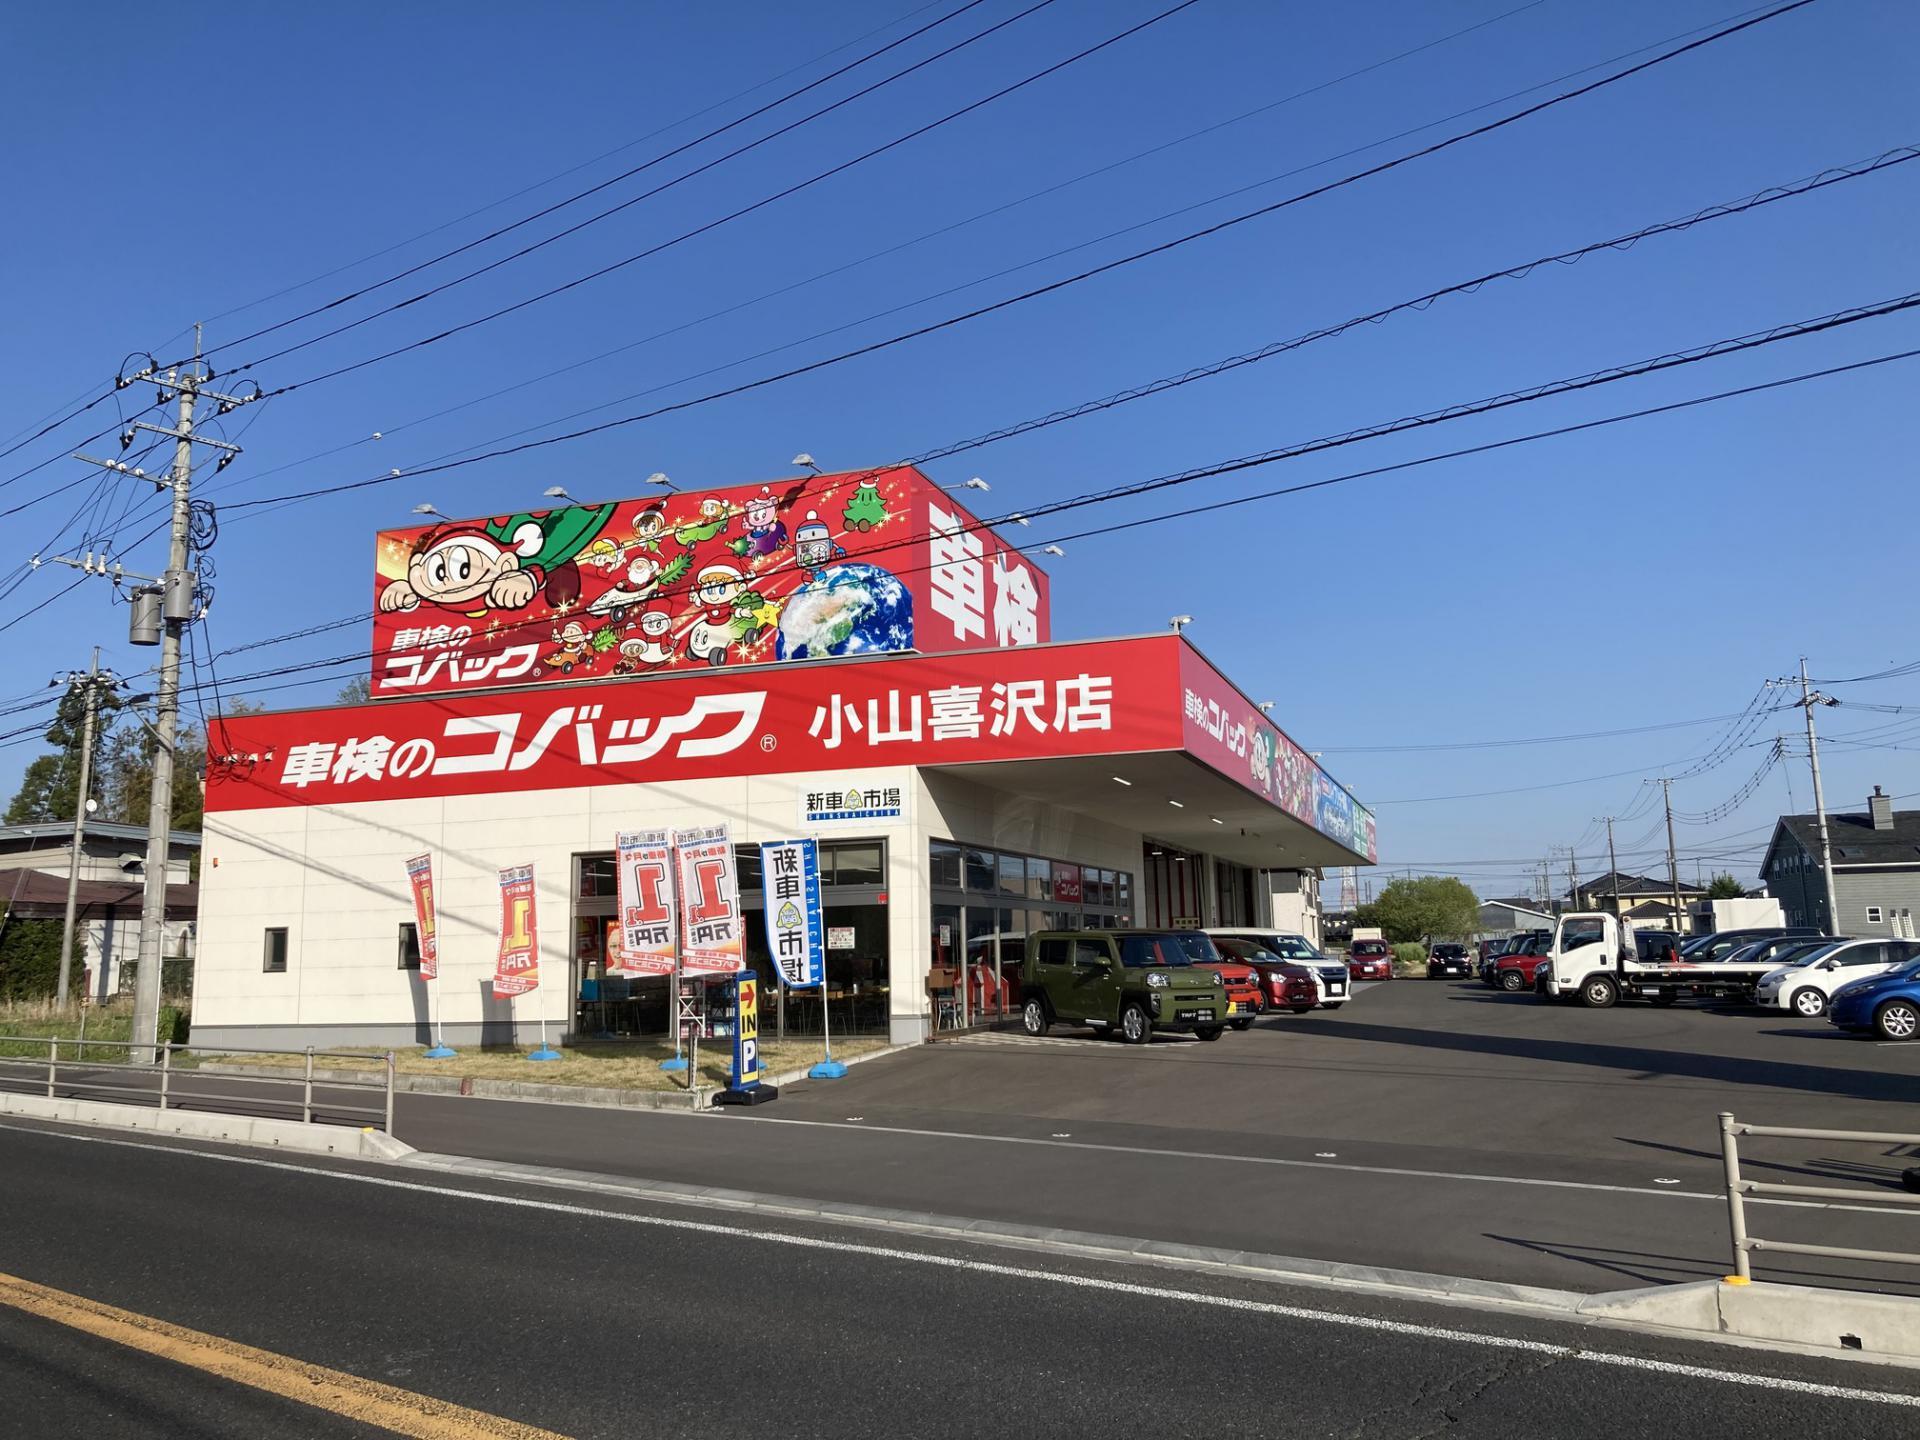 株式会社アスカ 新車市場 小山喜沢店